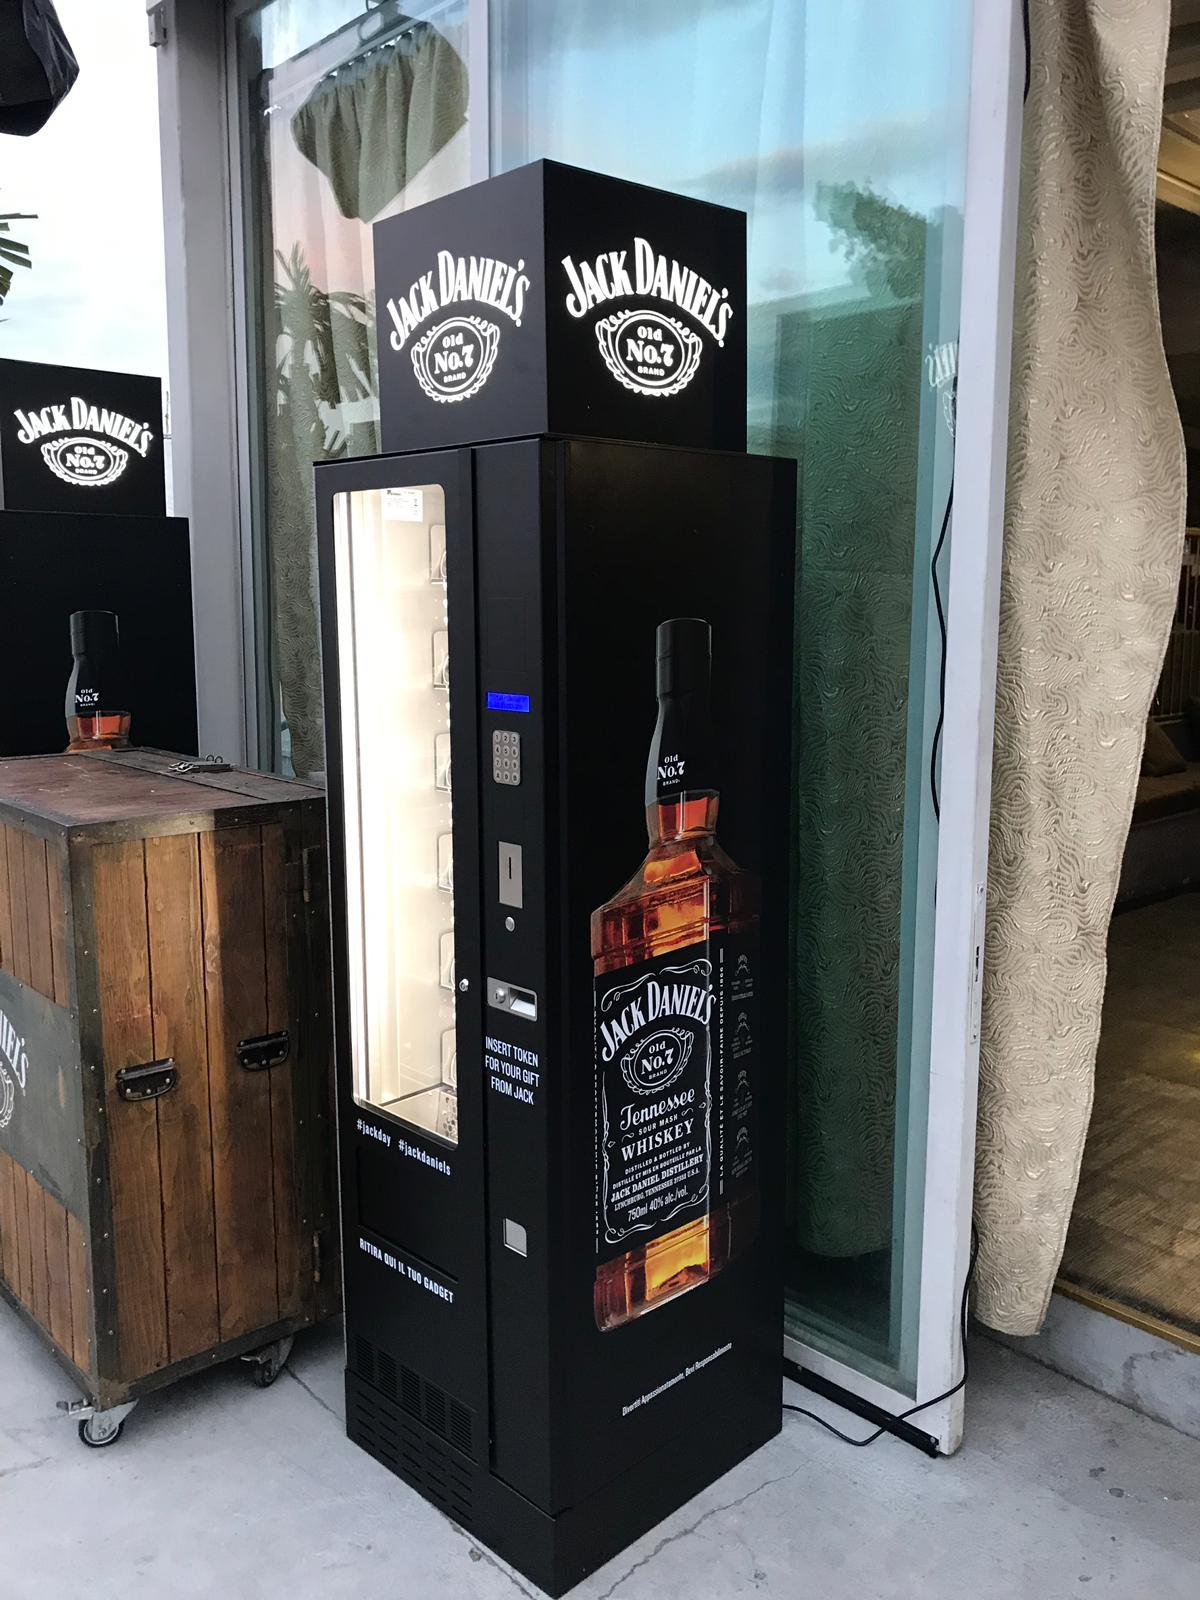 Rock style vending Jack Daniel's